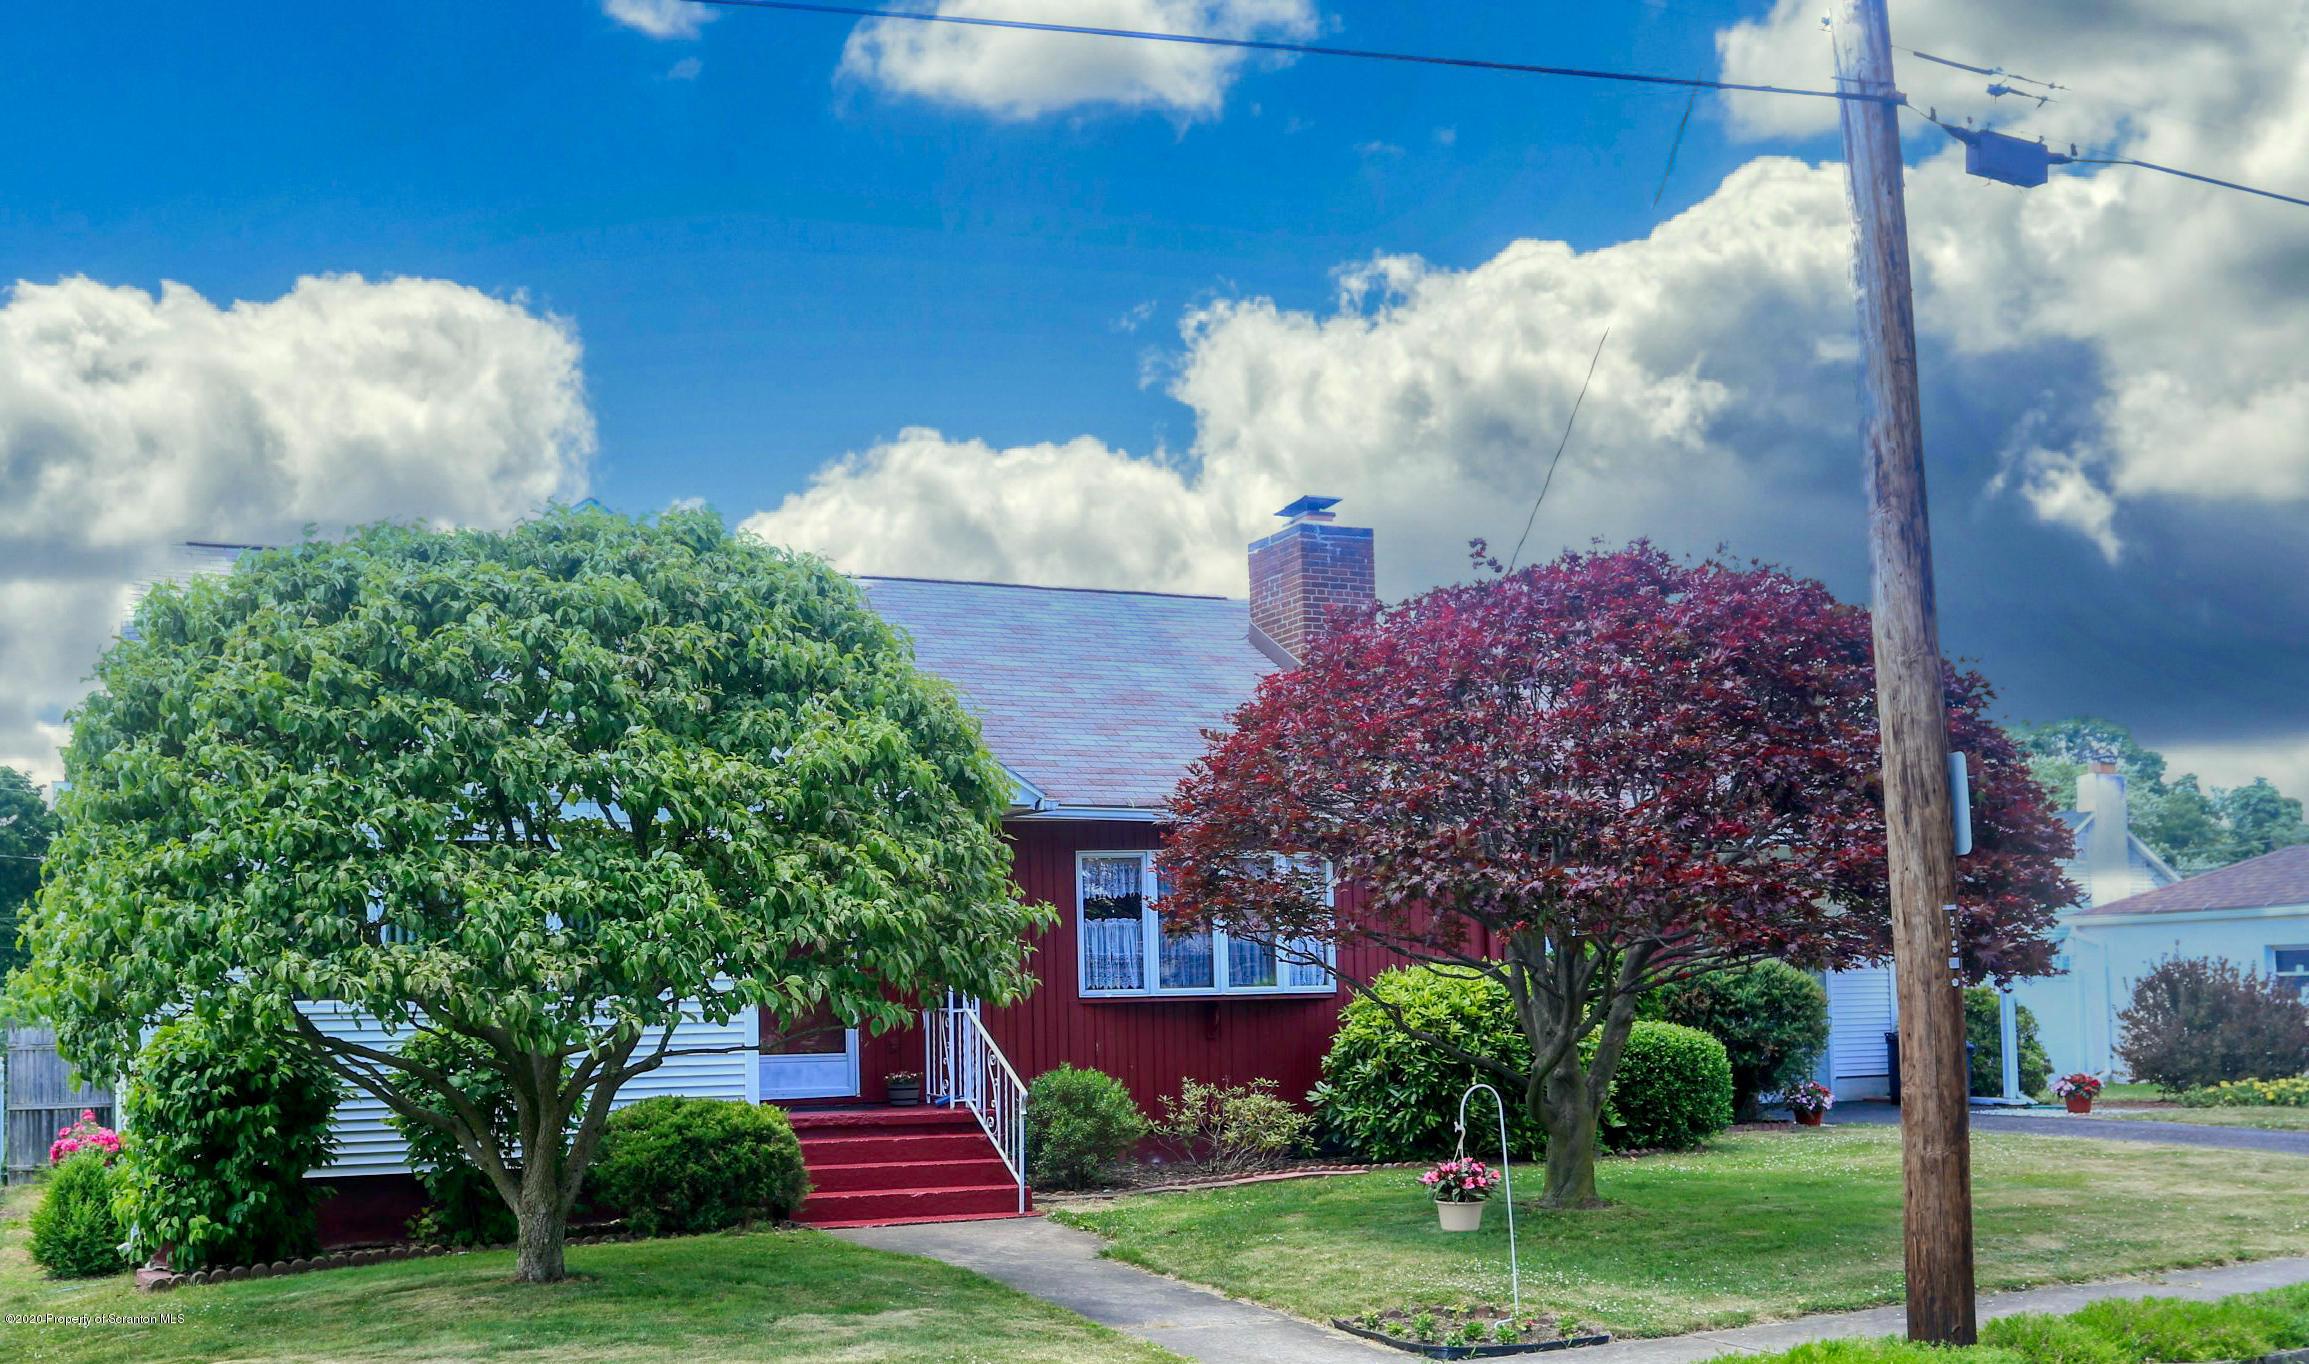 525 Crippen St, Moosic, Pennsylvania 18507, 3 Bedrooms Bedrooms, 7 Rooms Rooms,2 BathroomsBathrooms,Single Family,For Sale,Crippen,20-2272